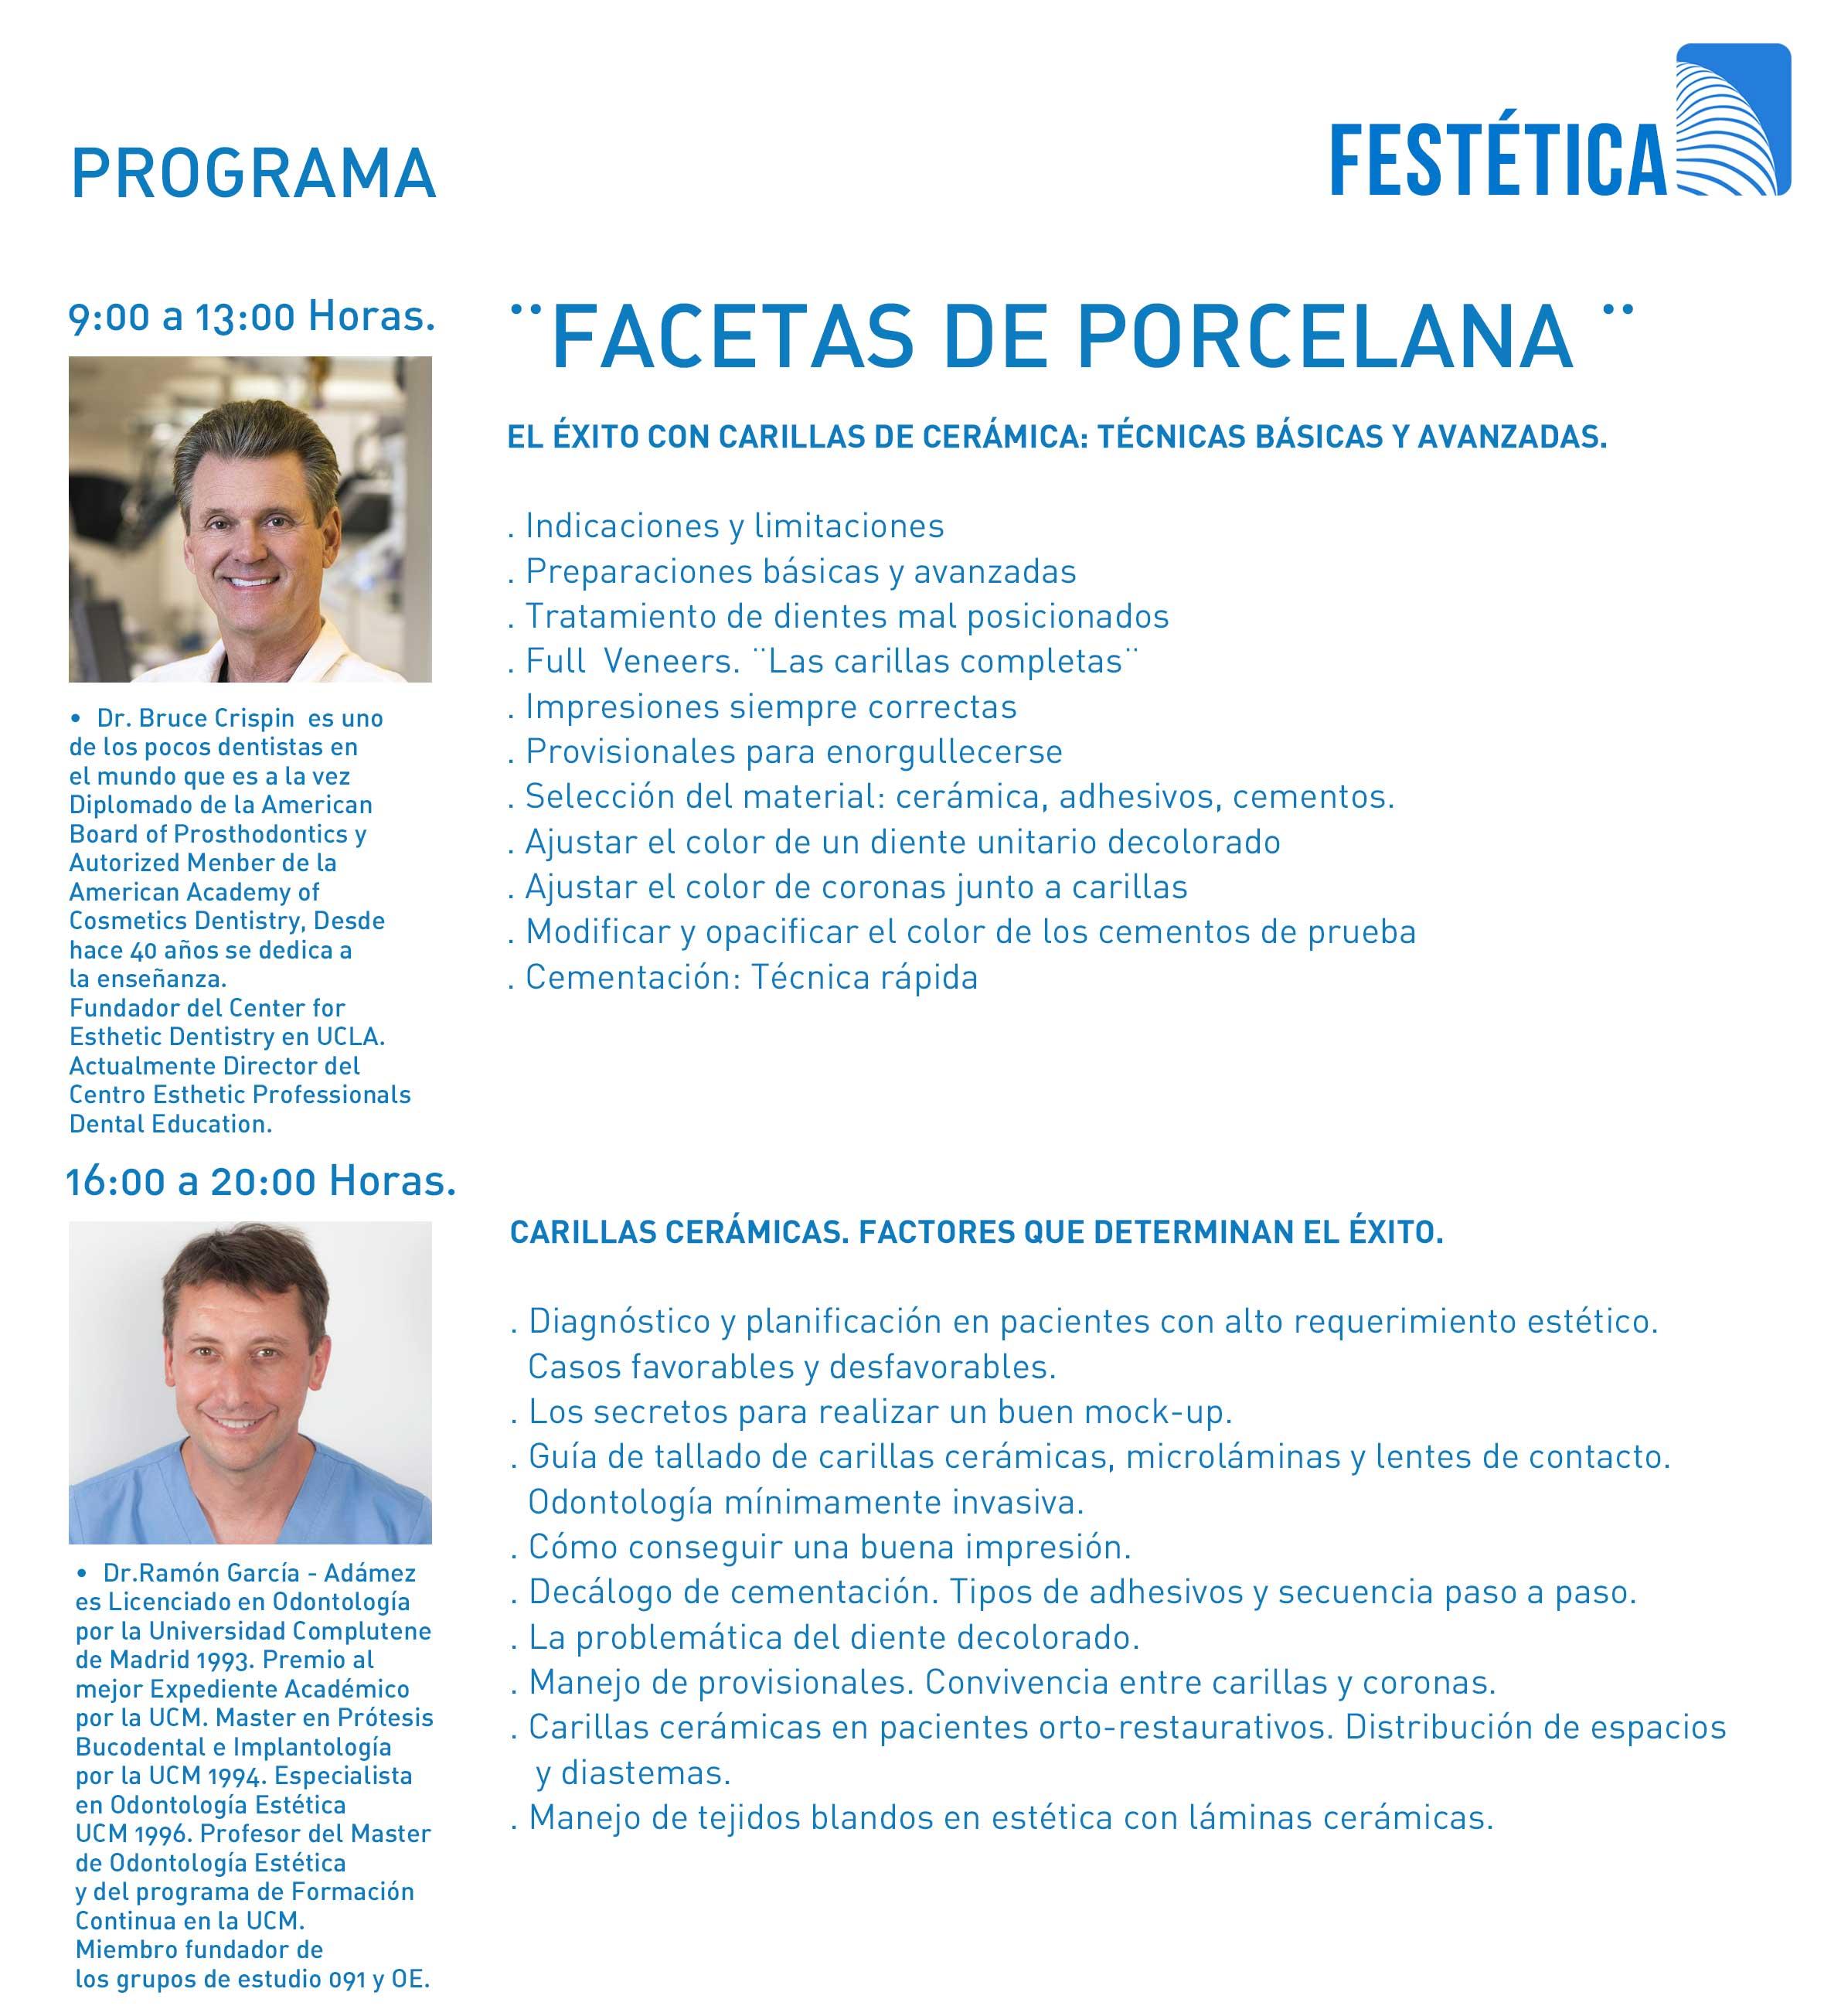 Odontología Estética. Facetas de Porcelana 1º Festival Internacional